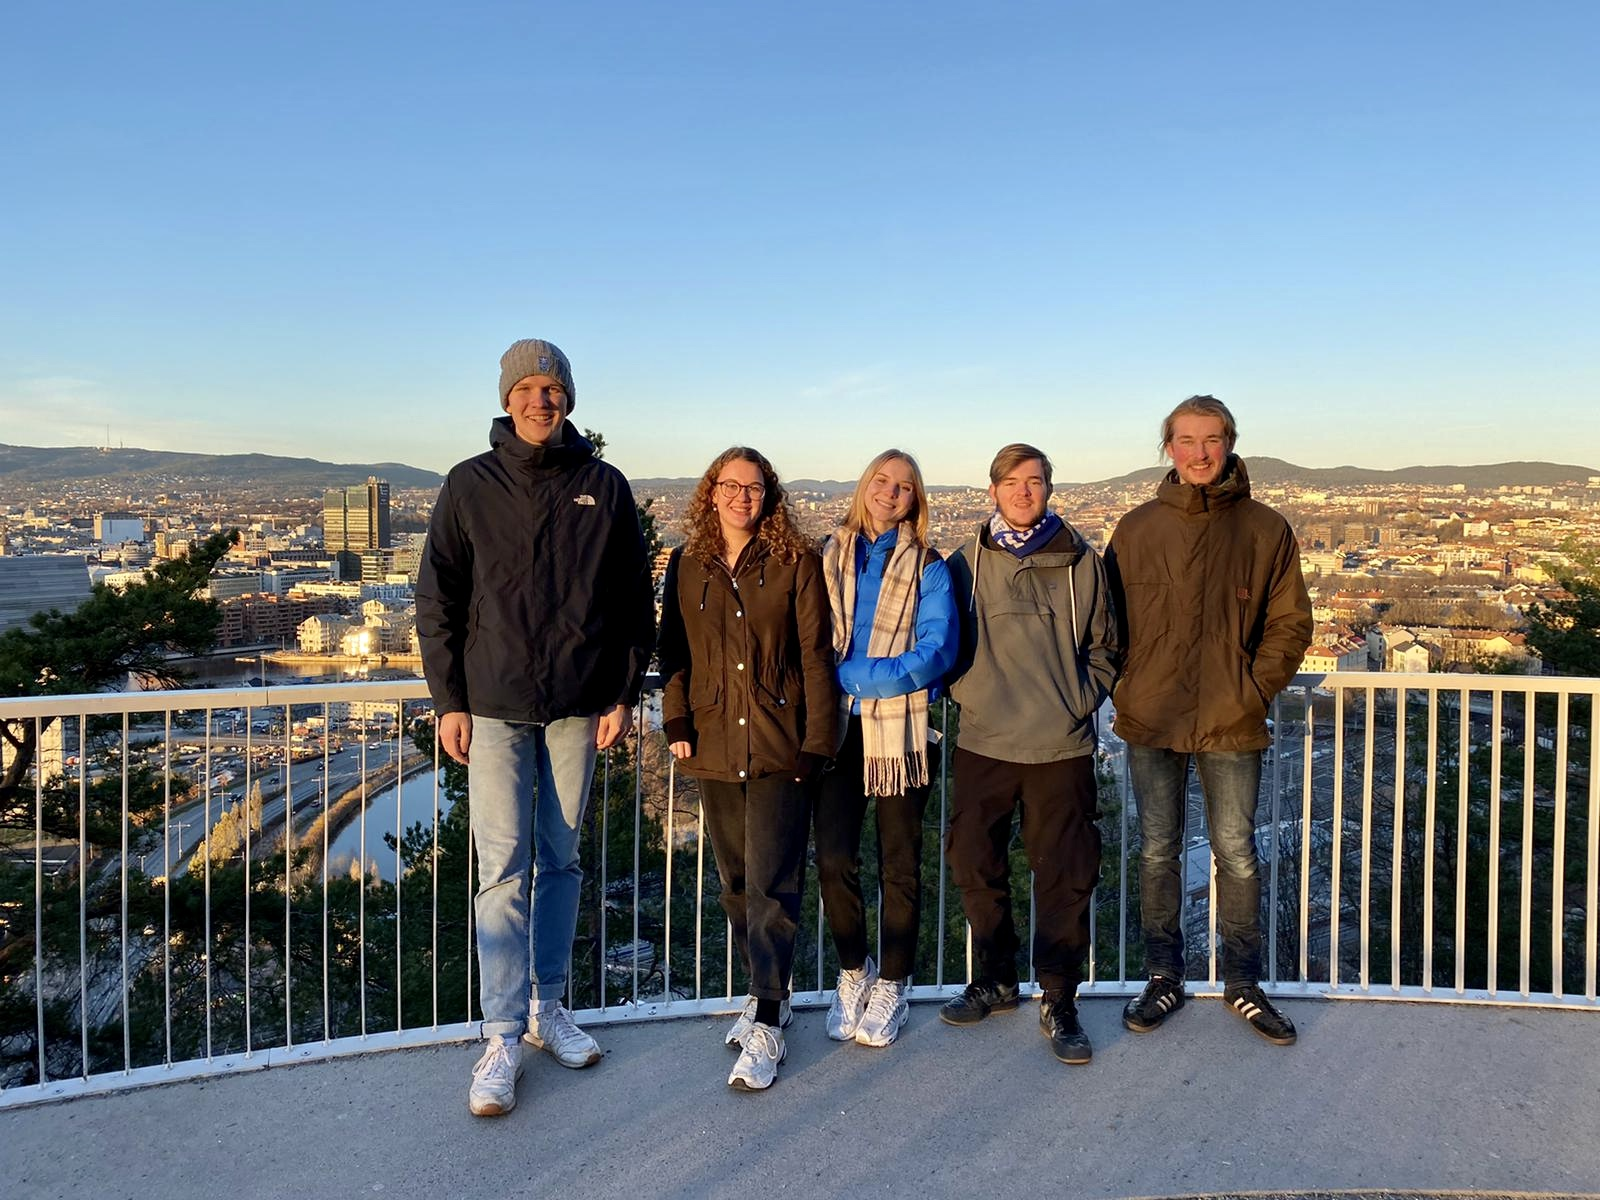 Paul, Elske, Franka, Tim, Jonas im Ekebergparken